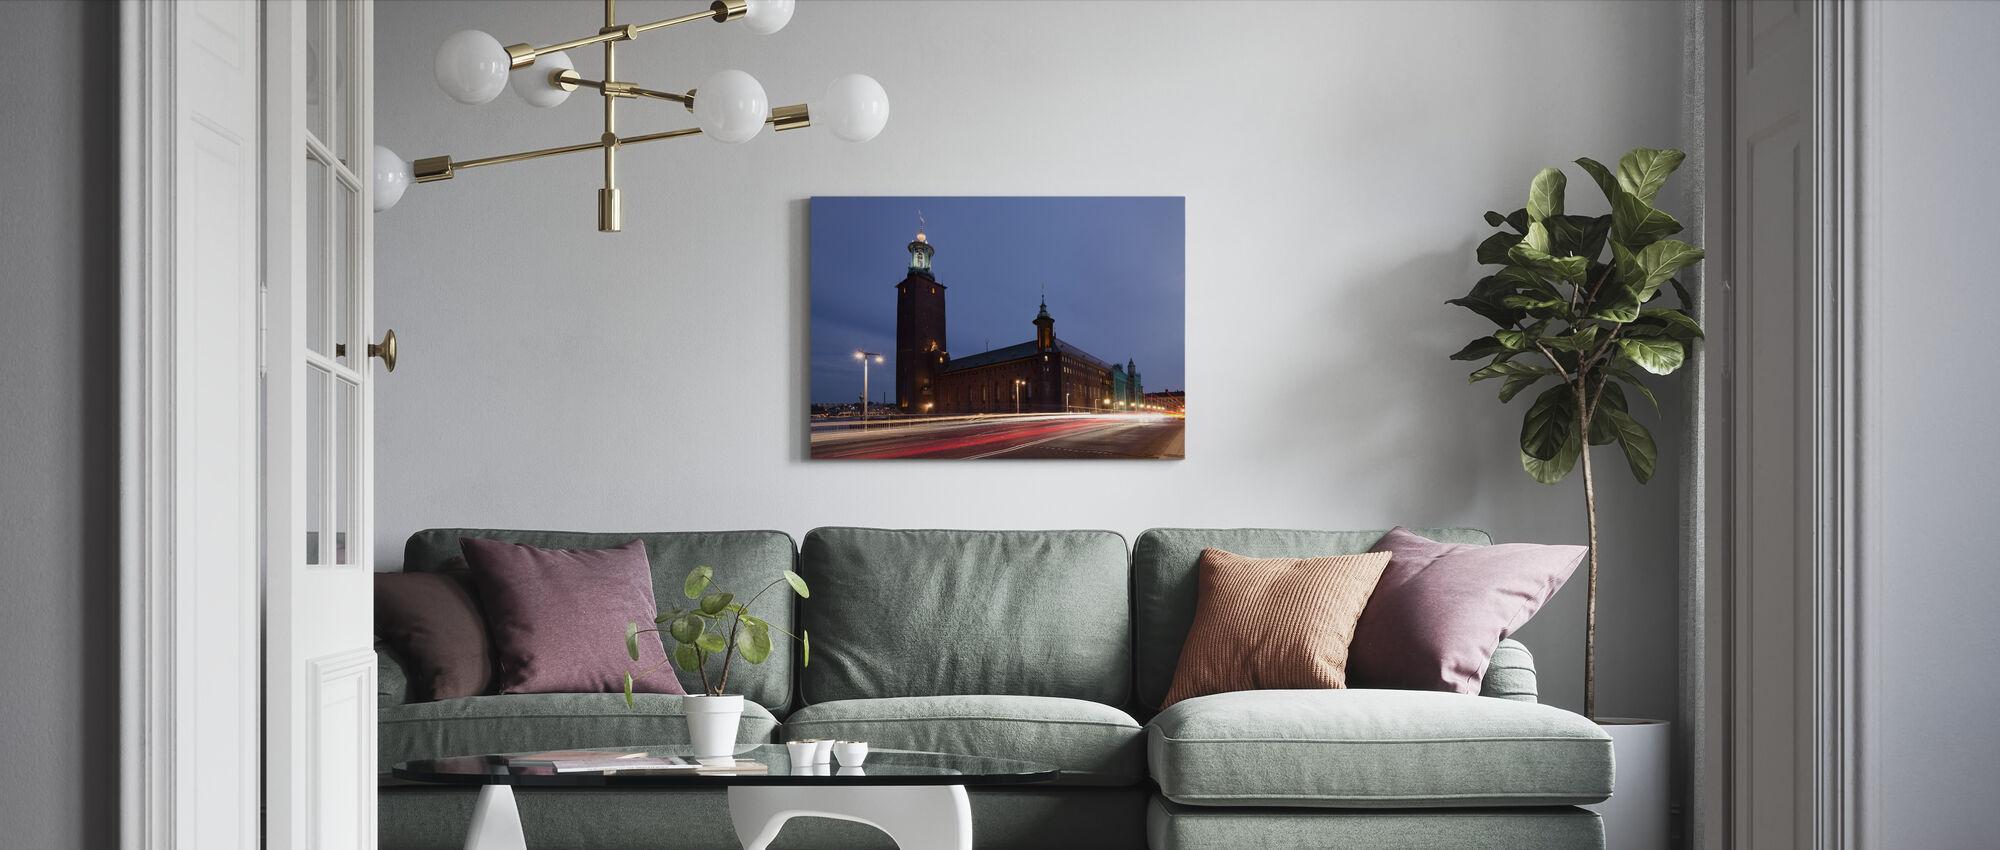 Stockholm City hall Light Streaks - Canvas print - Living Room